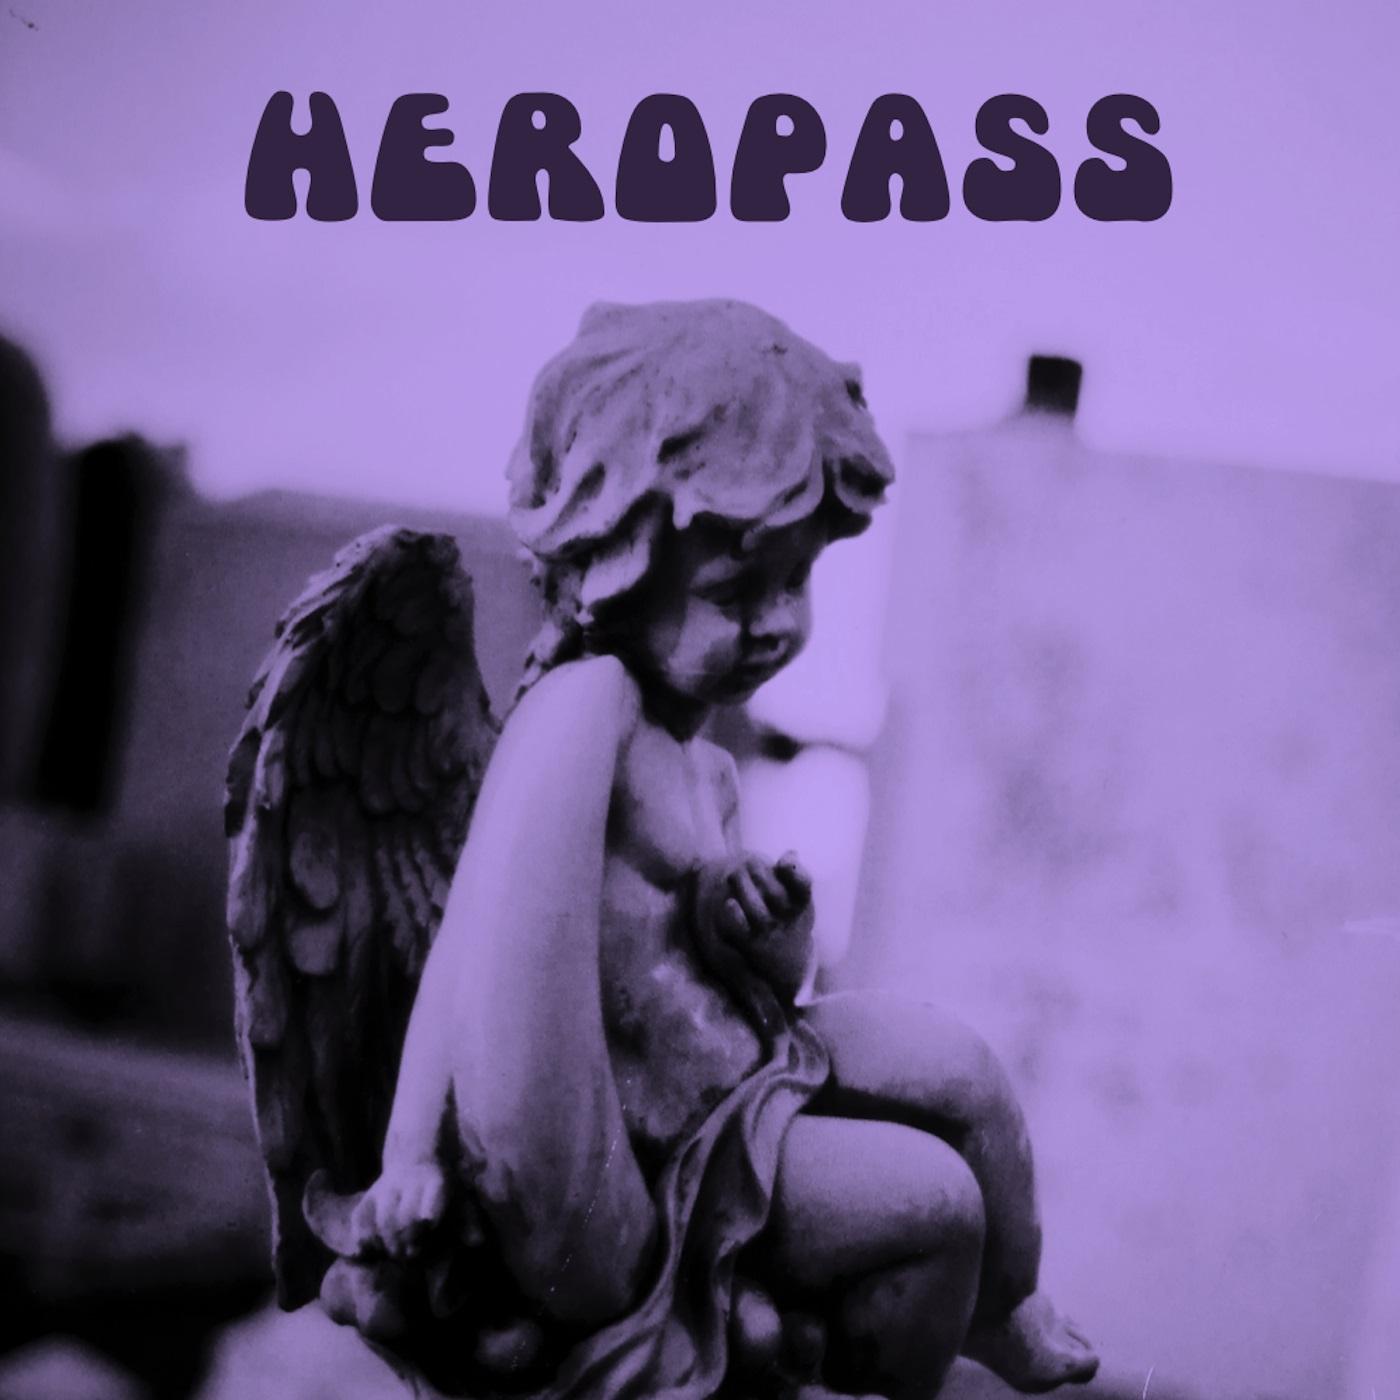 Heropass – Merciless Live